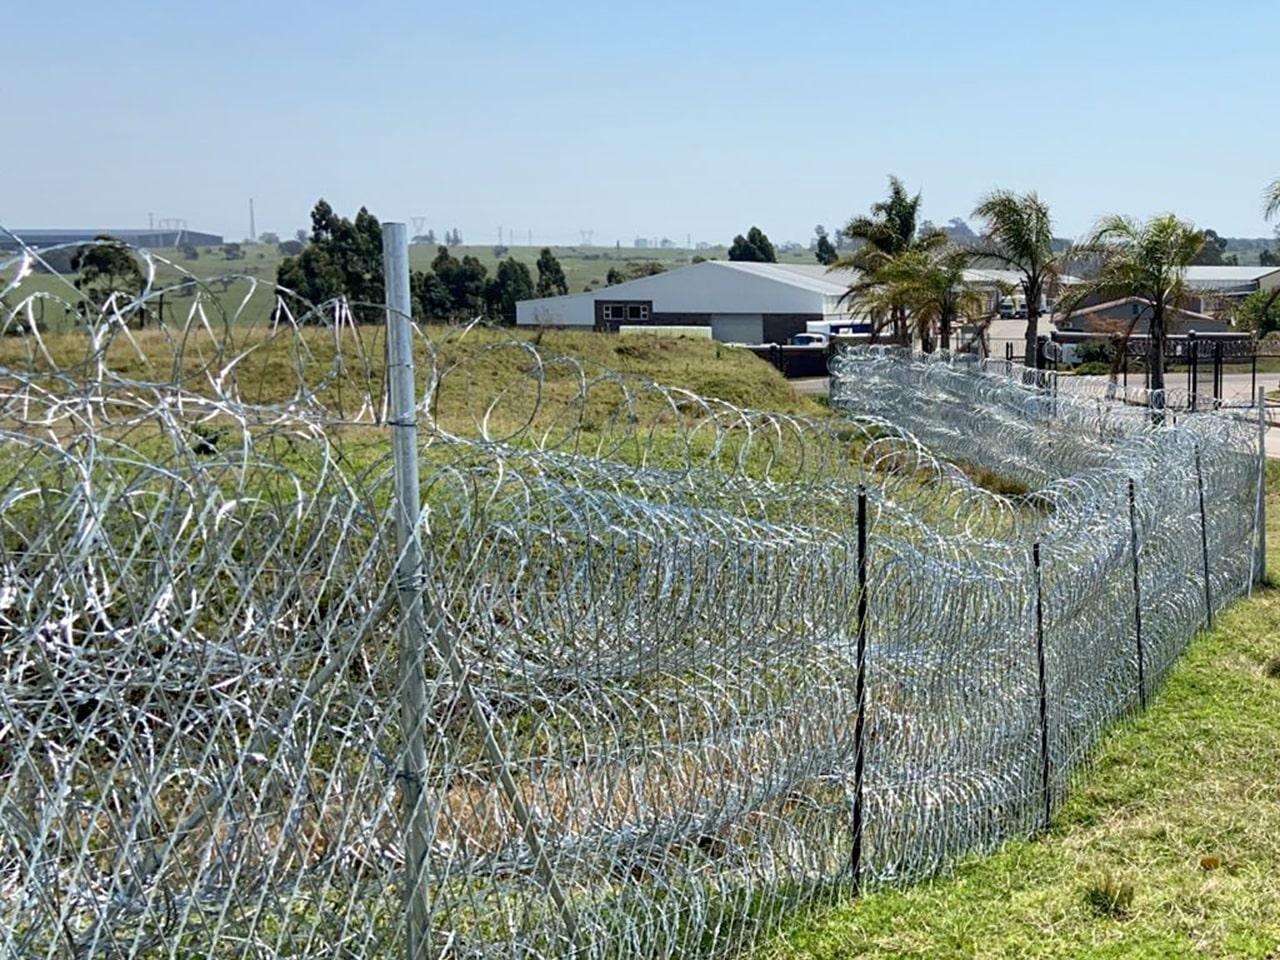 Concertina razor wire coils as wall perimeter protection